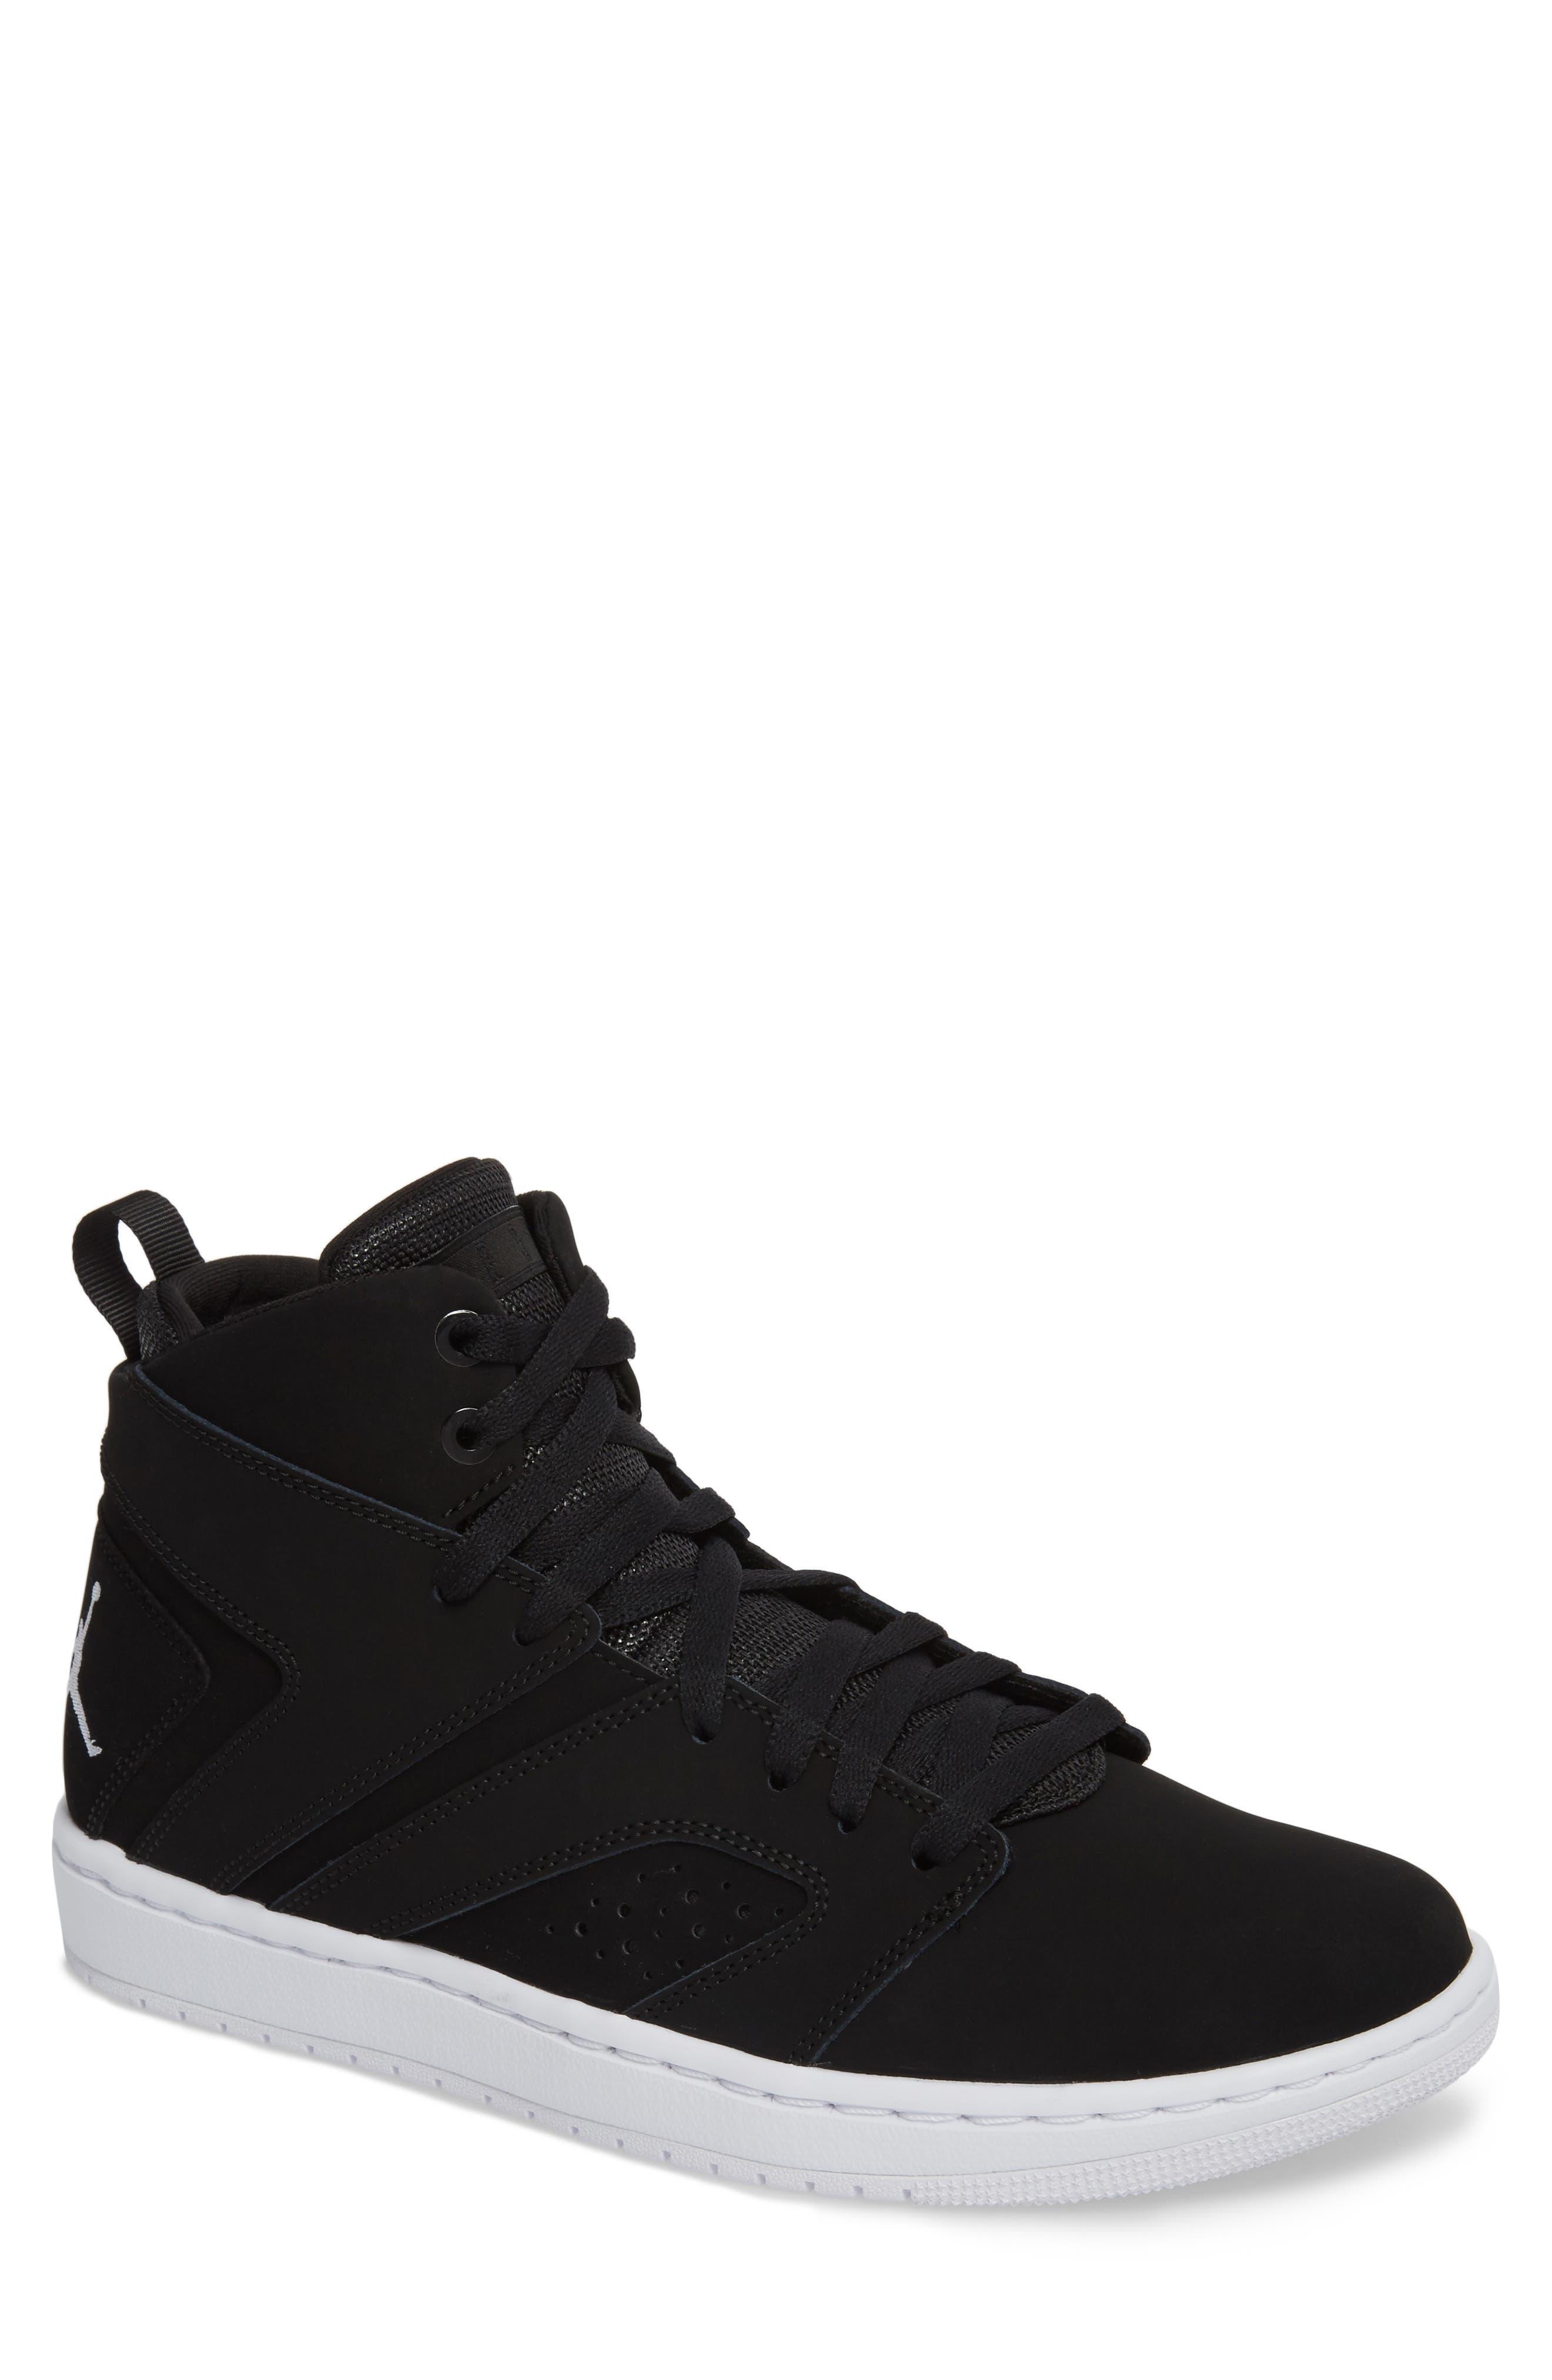 Air Jordan Flight Next Sneaker,                         Main,                         color, 010